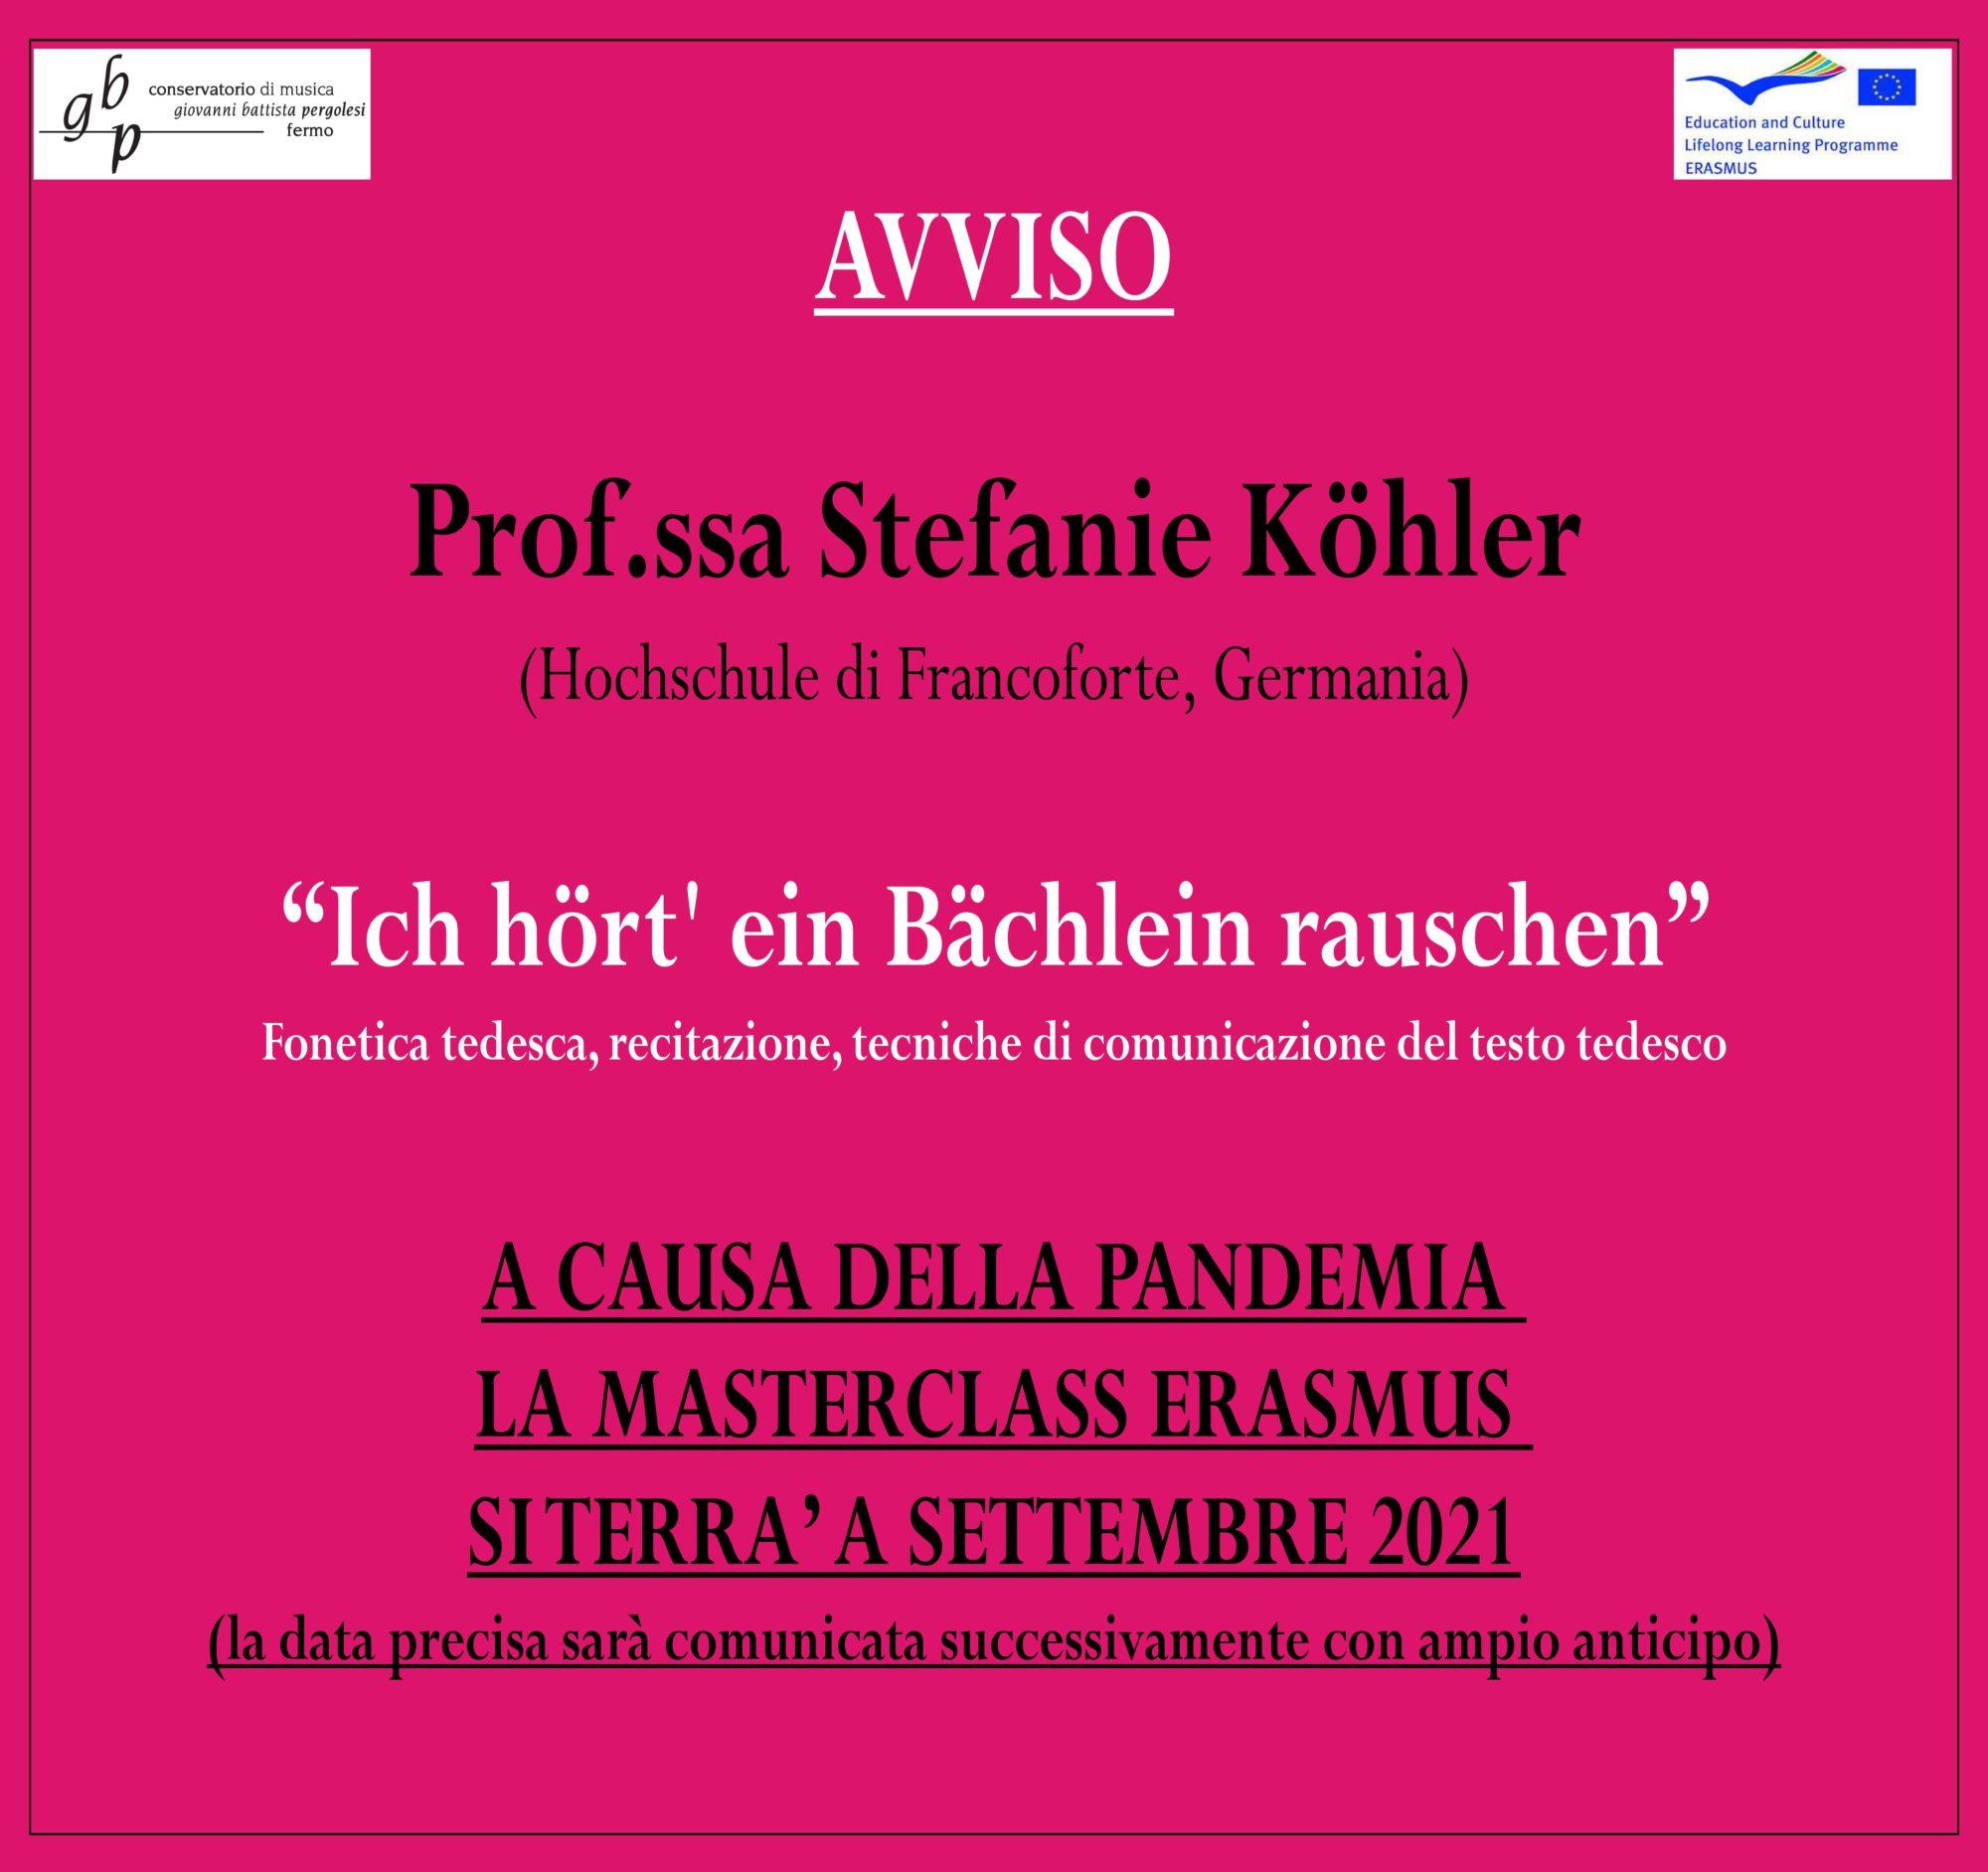 Locandina Koehler 2021 - AVVISO POSTICIPO 2